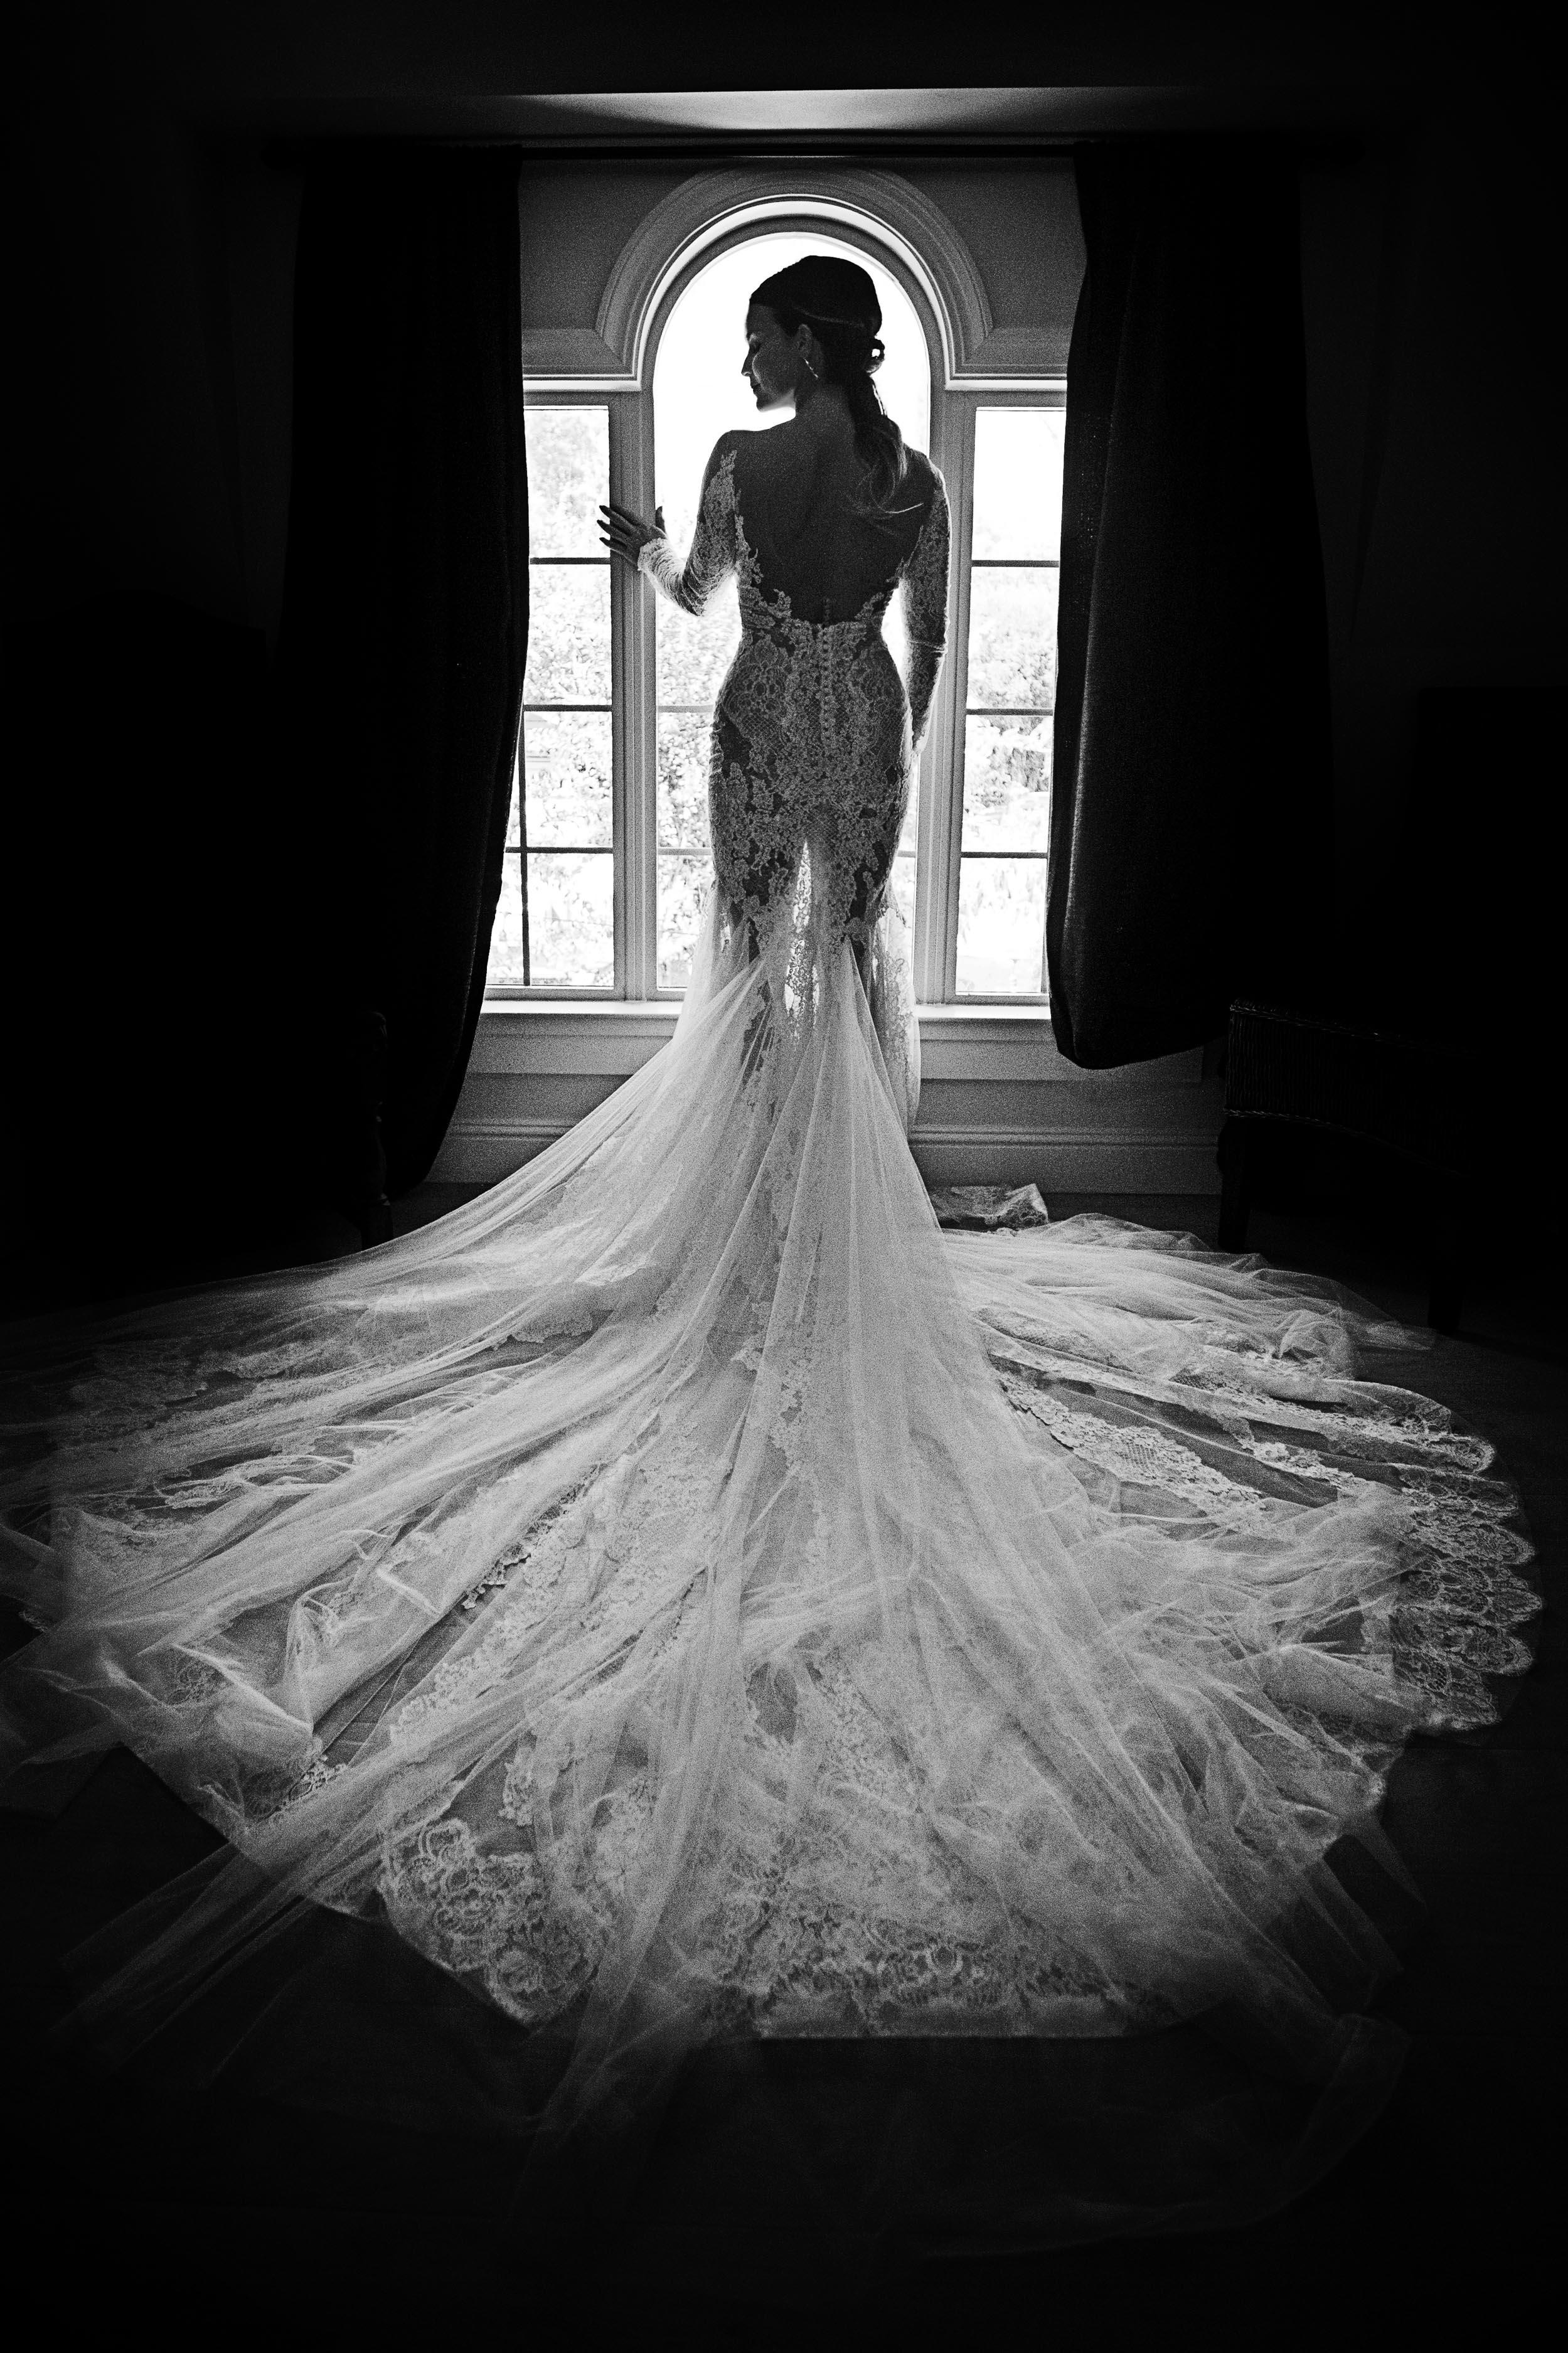 weddings-napa-03.jpg